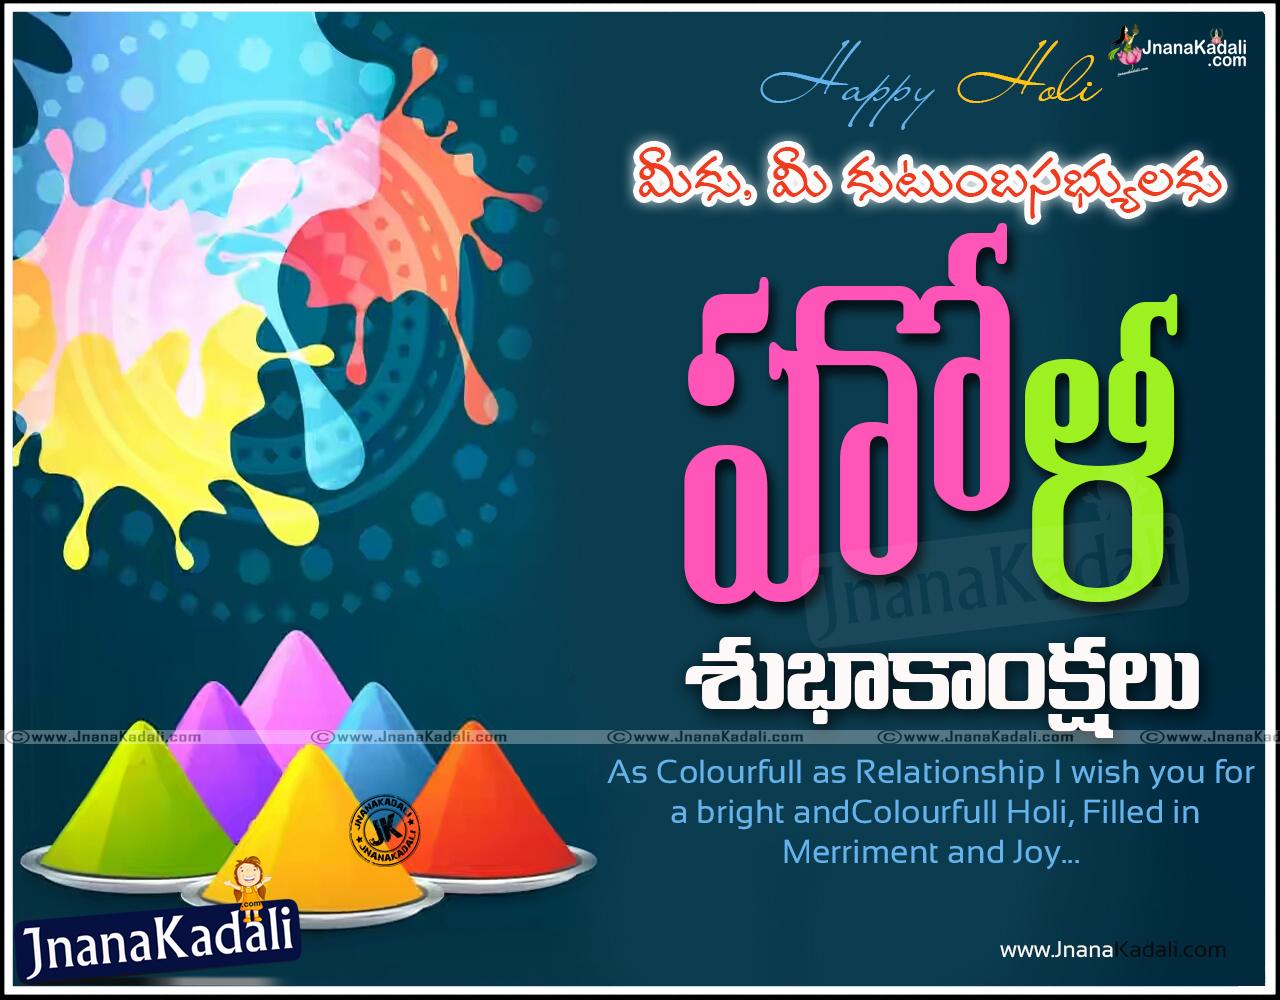 Telugu holi kavithalu poems greetings jnana kadali telugu telugu holi kavithalu holi telugu poems holi telugu greetings holi telugu wishes m4hsunfo